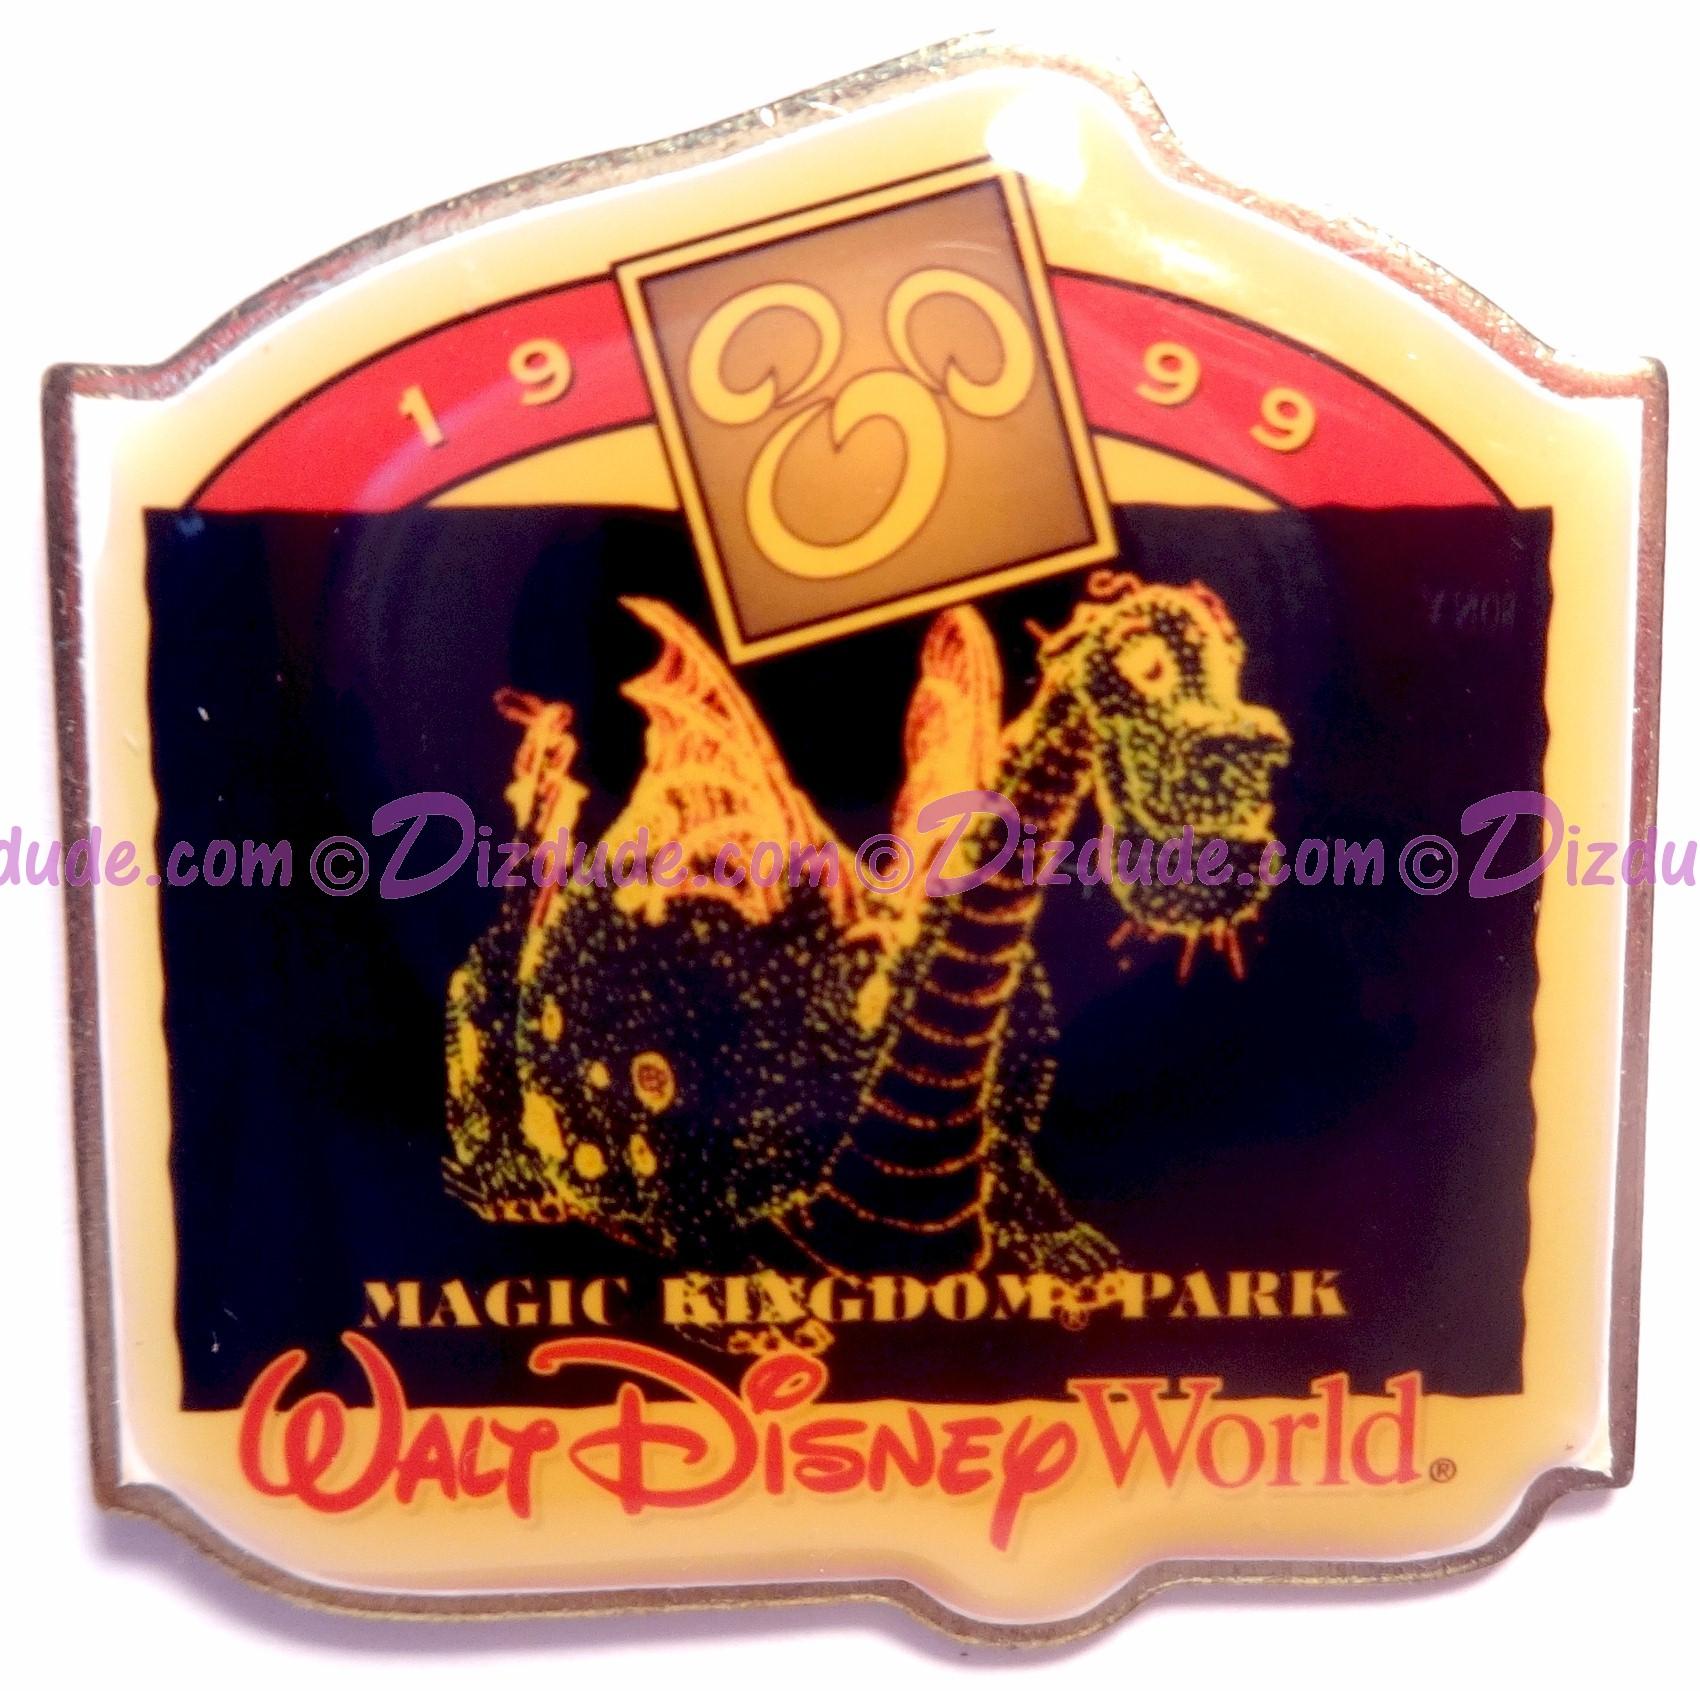 Walt Disney World Something New in Every Corner Press Set - Magic Kingdom Park / Electric Light Parade - Elliott Pin LE 1200 © Dizdude.com